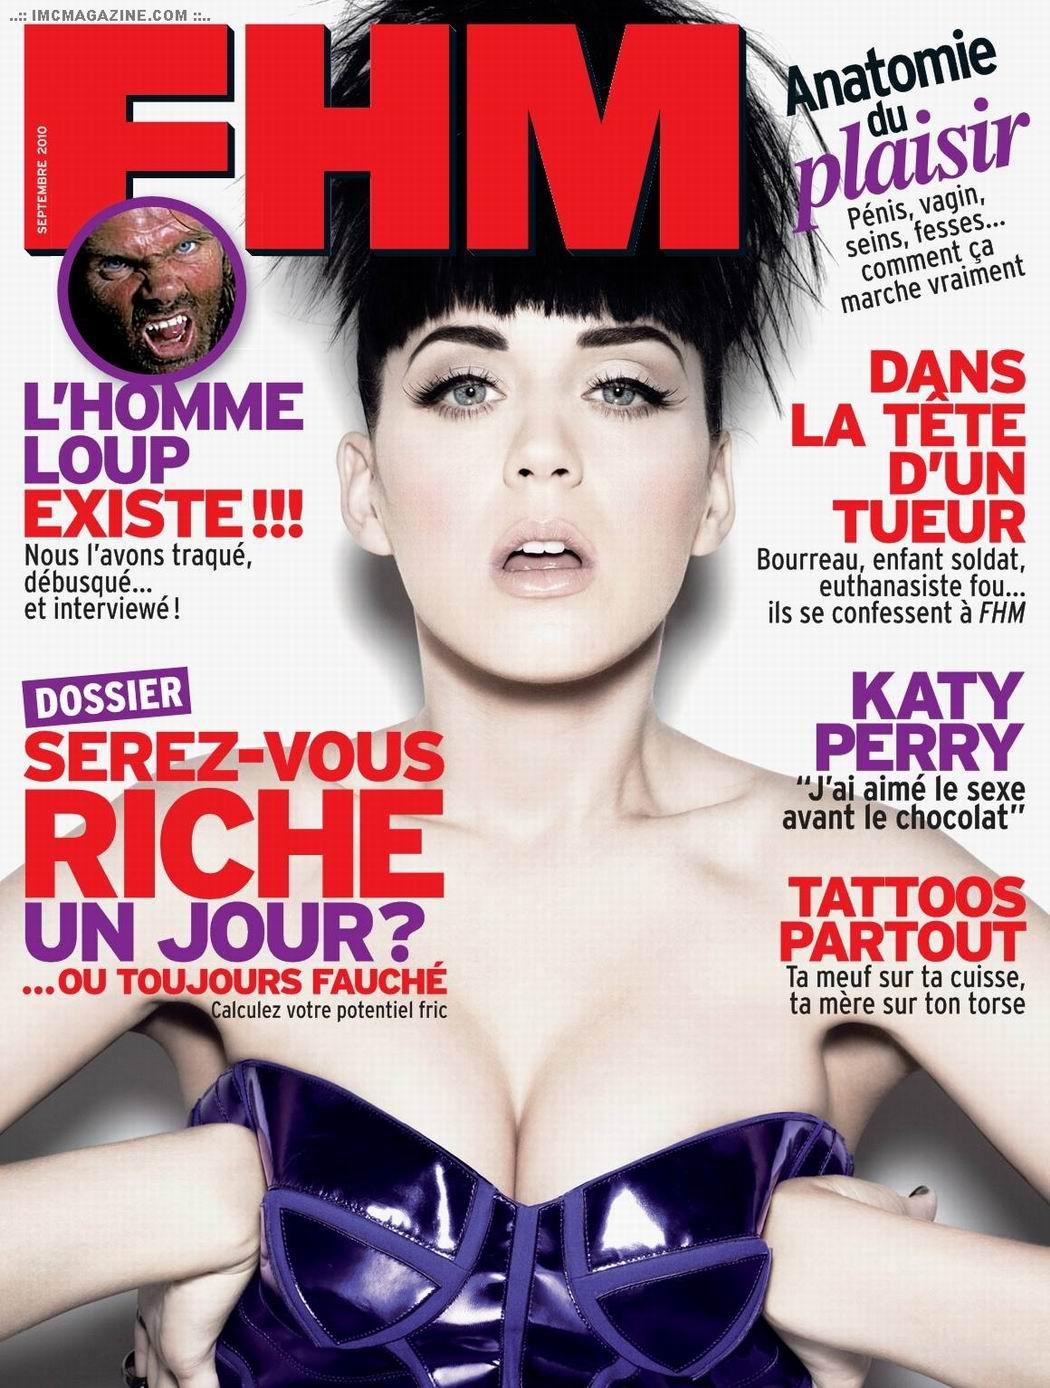 Кэти Перри (Katy Perry) в журнале FHM Франция, сентябрь 2010